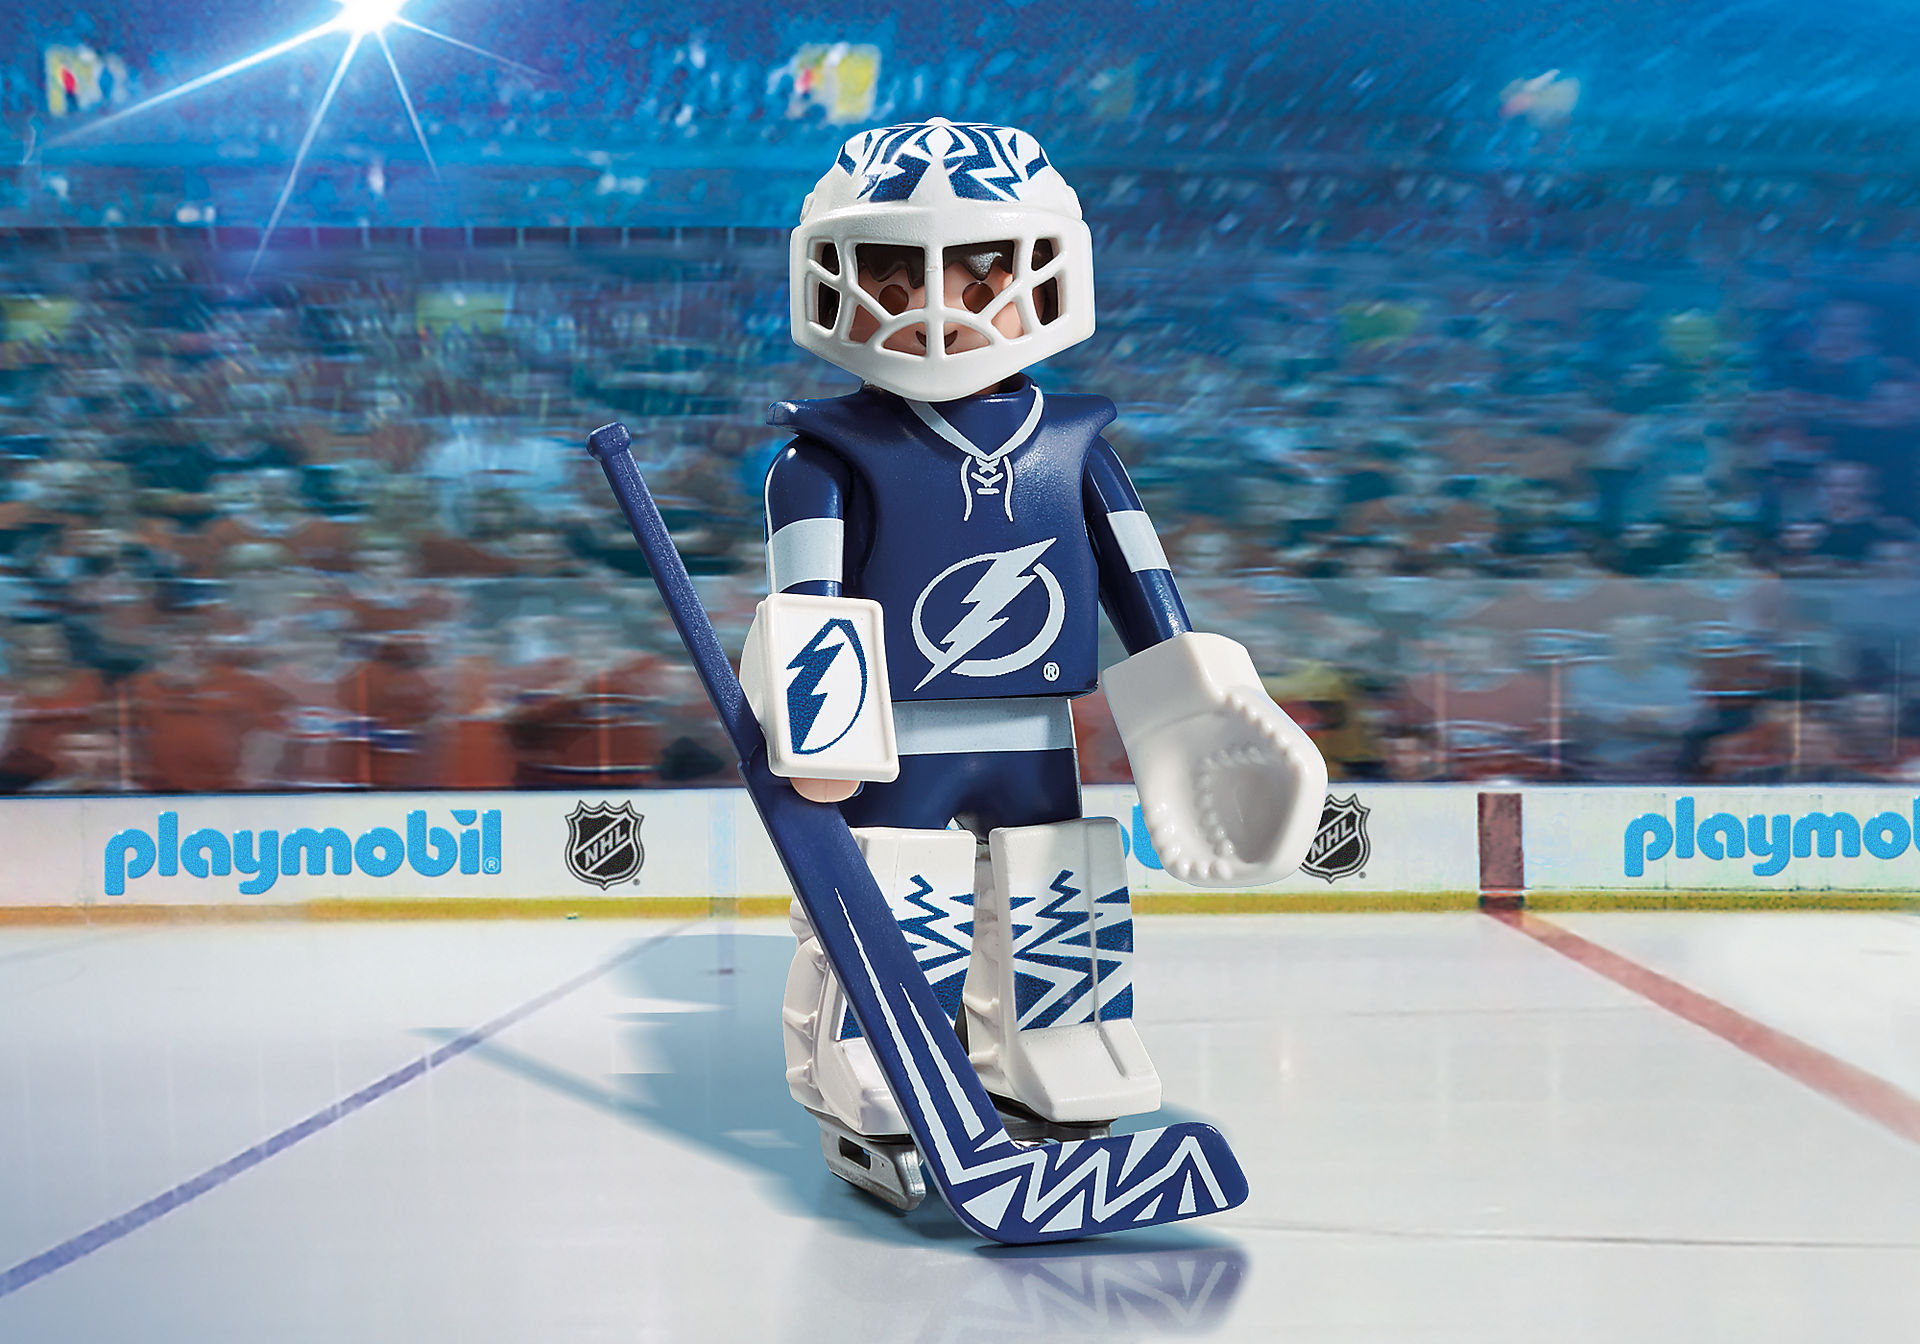 http://media.playmobil.com/i/playmobil/9185_product_detail/NHL® Tampa Bay Lightning® Goalie